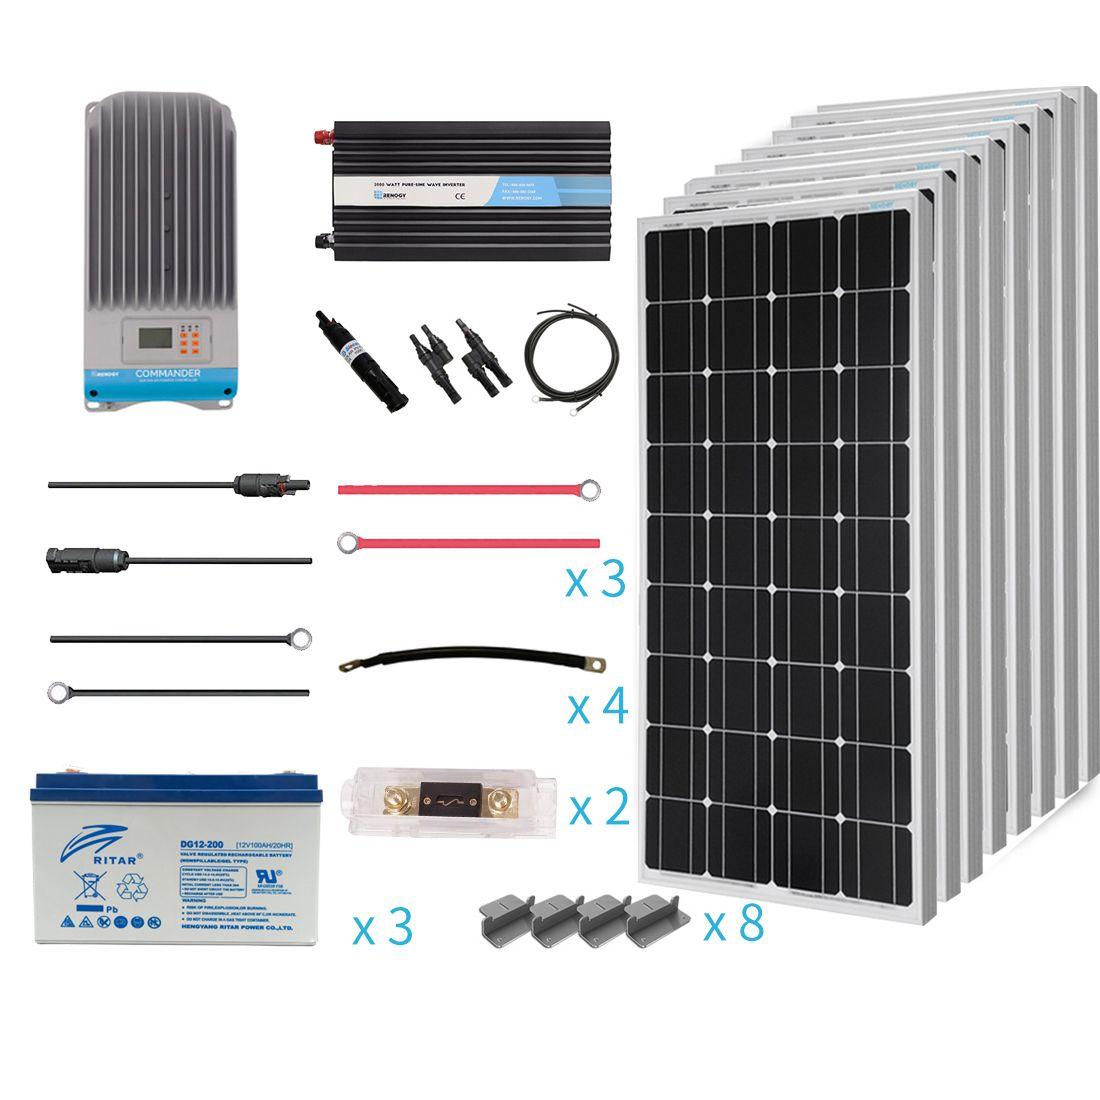 Renogy 800 Watt 12 Volt Complete Solar Premium Kit Solar System Kit Solar Panel Kits Solar Panel Installation